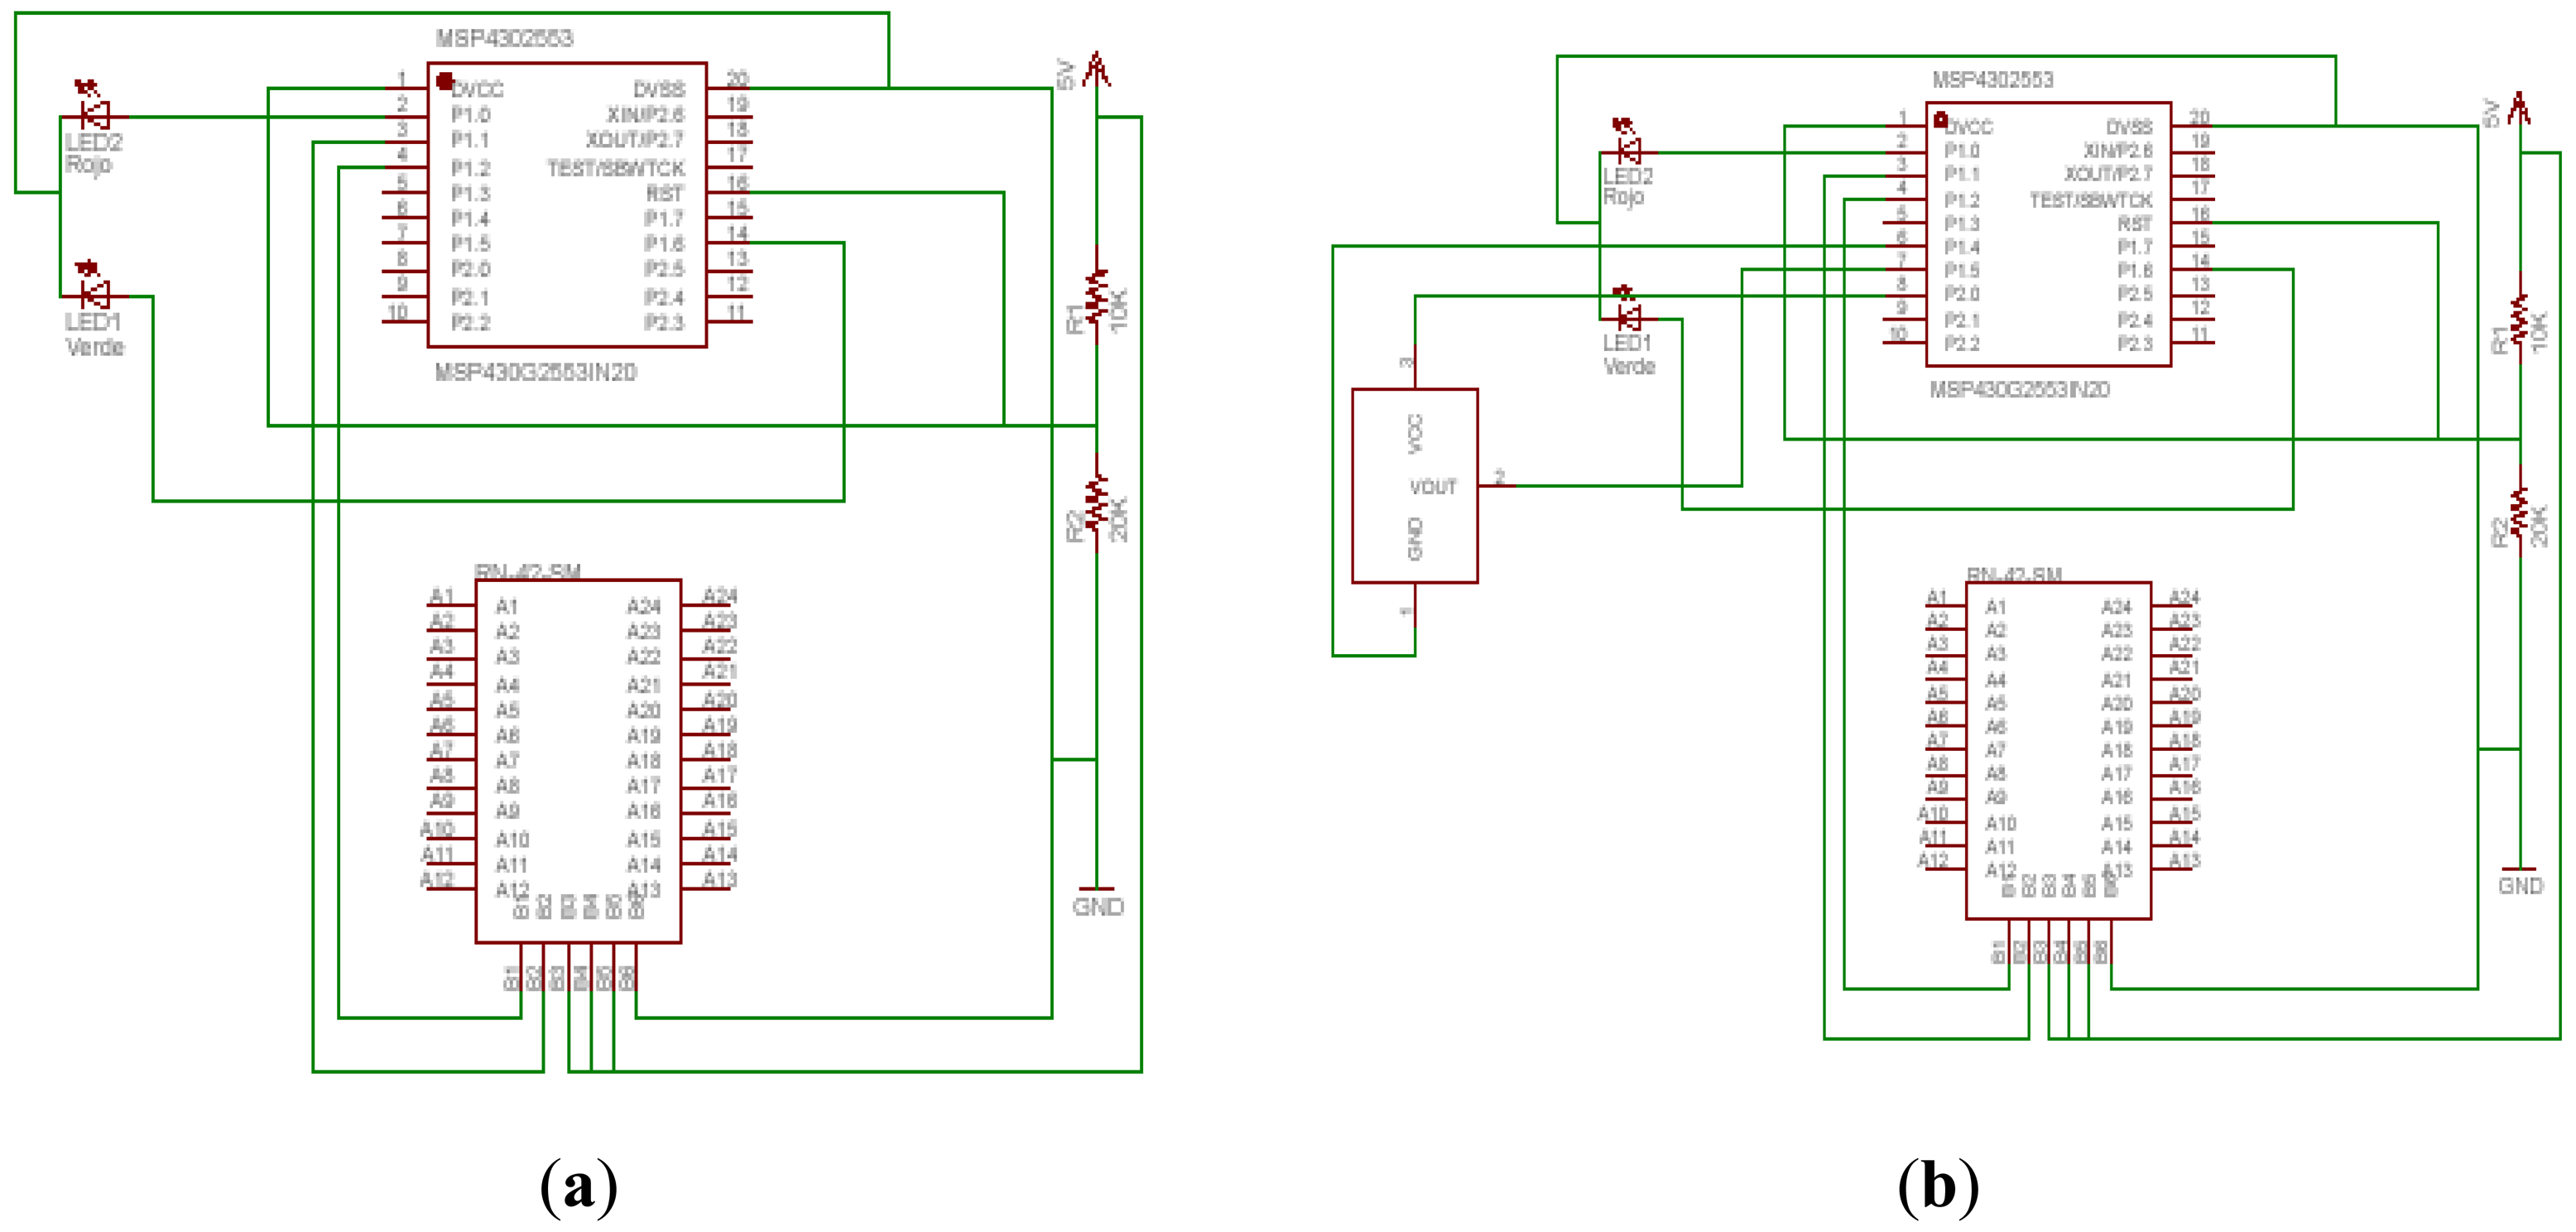 Sensors Free Full Text A Novel Low Cost Sensor Prototype For Stinson Wiring Diagram 13 02848f6 1024